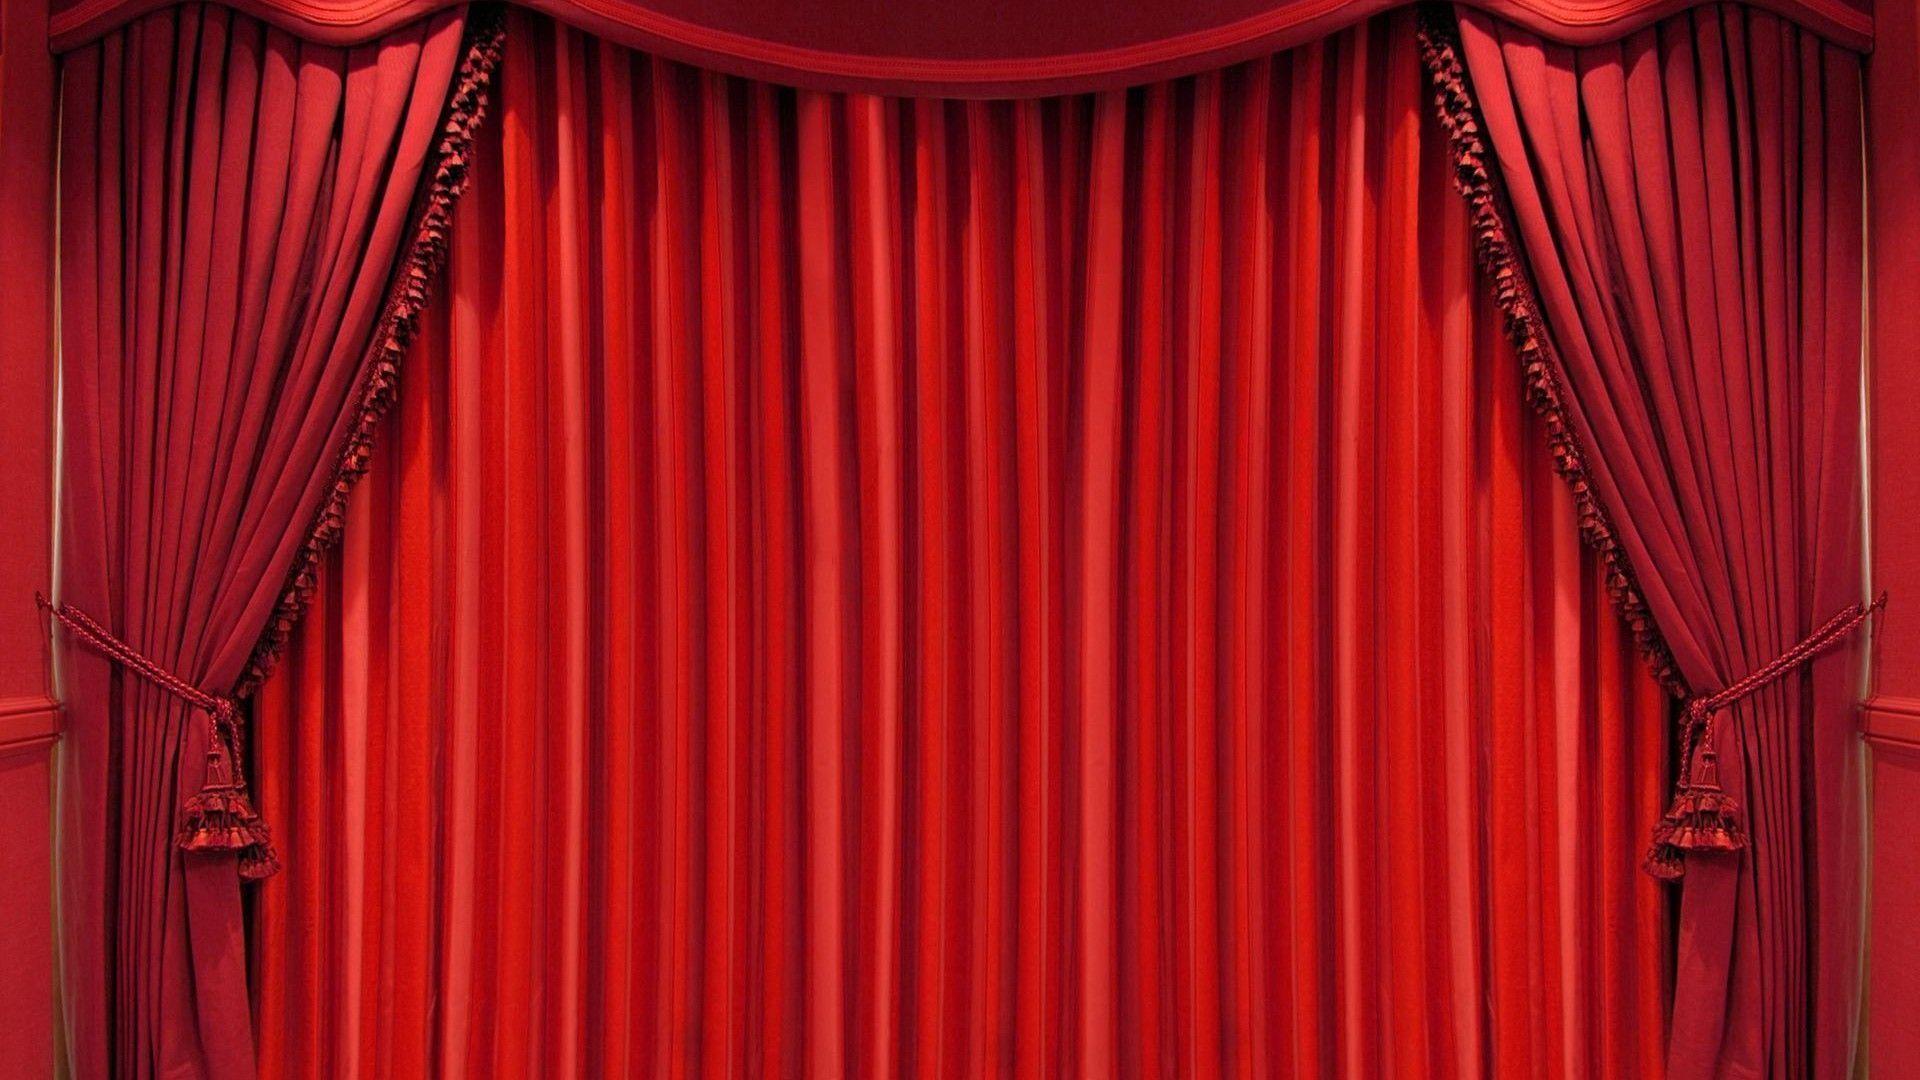 Stage curtain wallpaper curtain designs - Resultado De Imagem Para Texture Palace 1920x1080